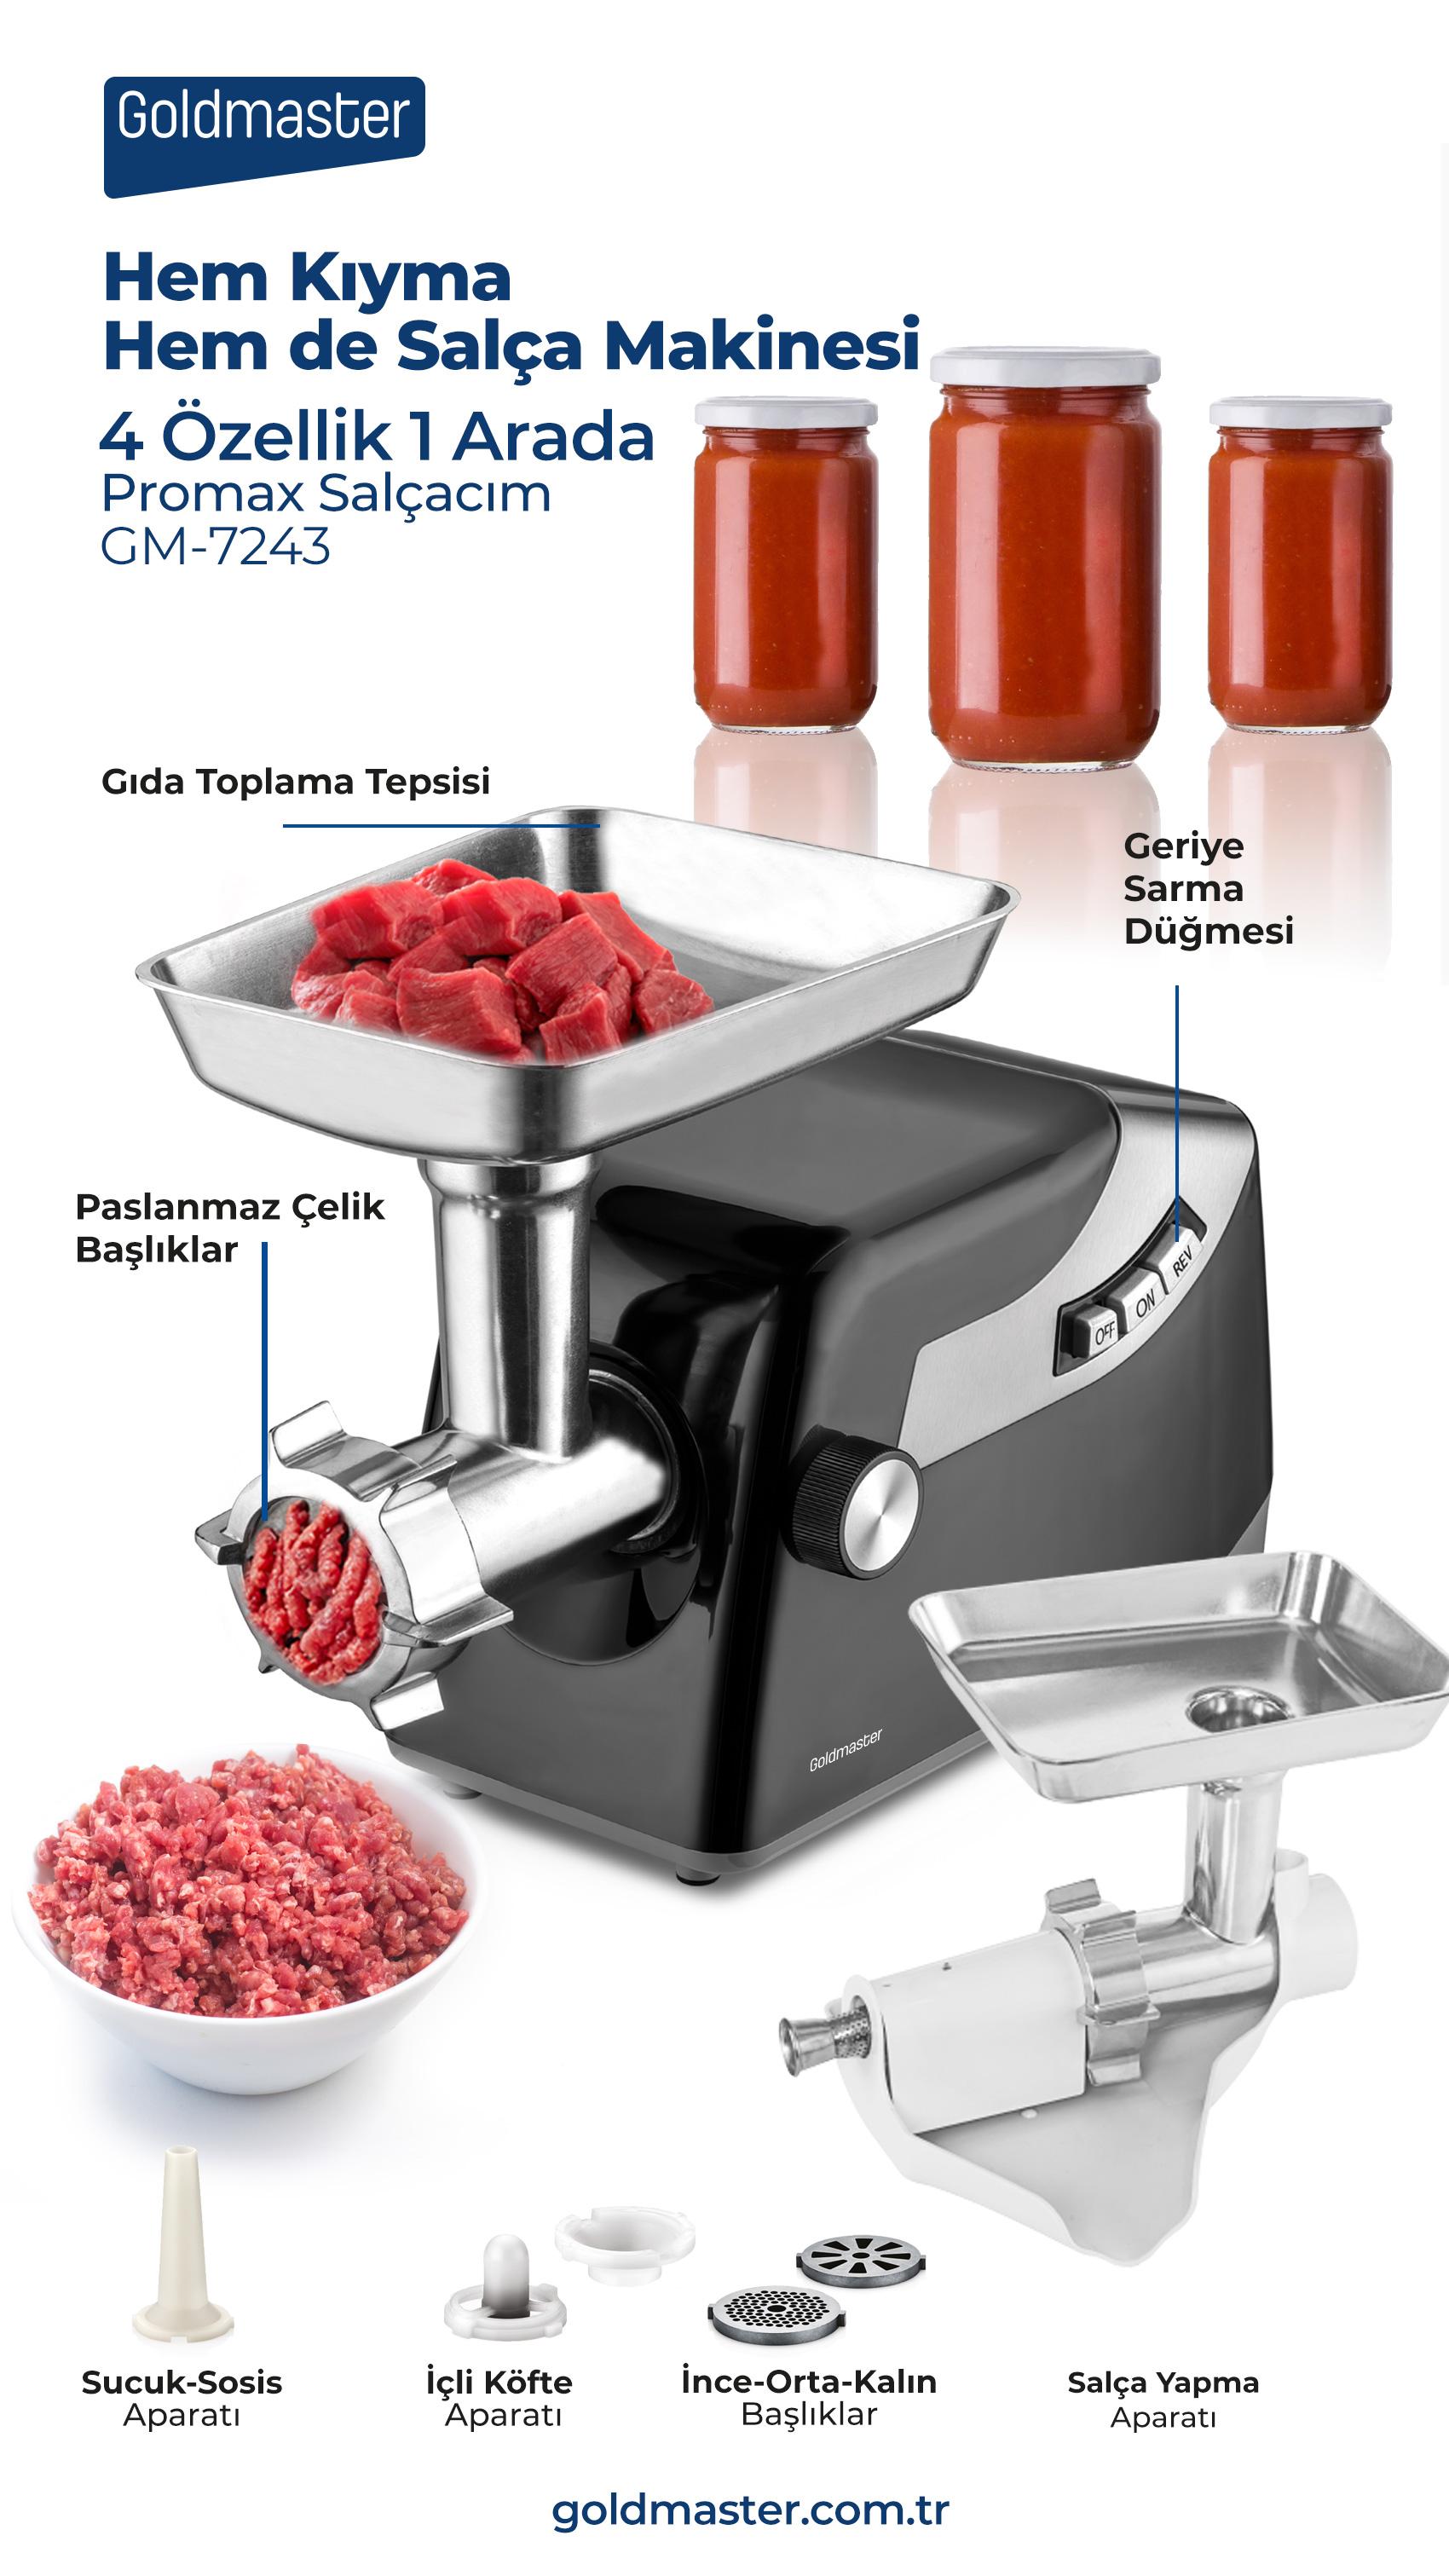 Promax Kıyma Makinesi